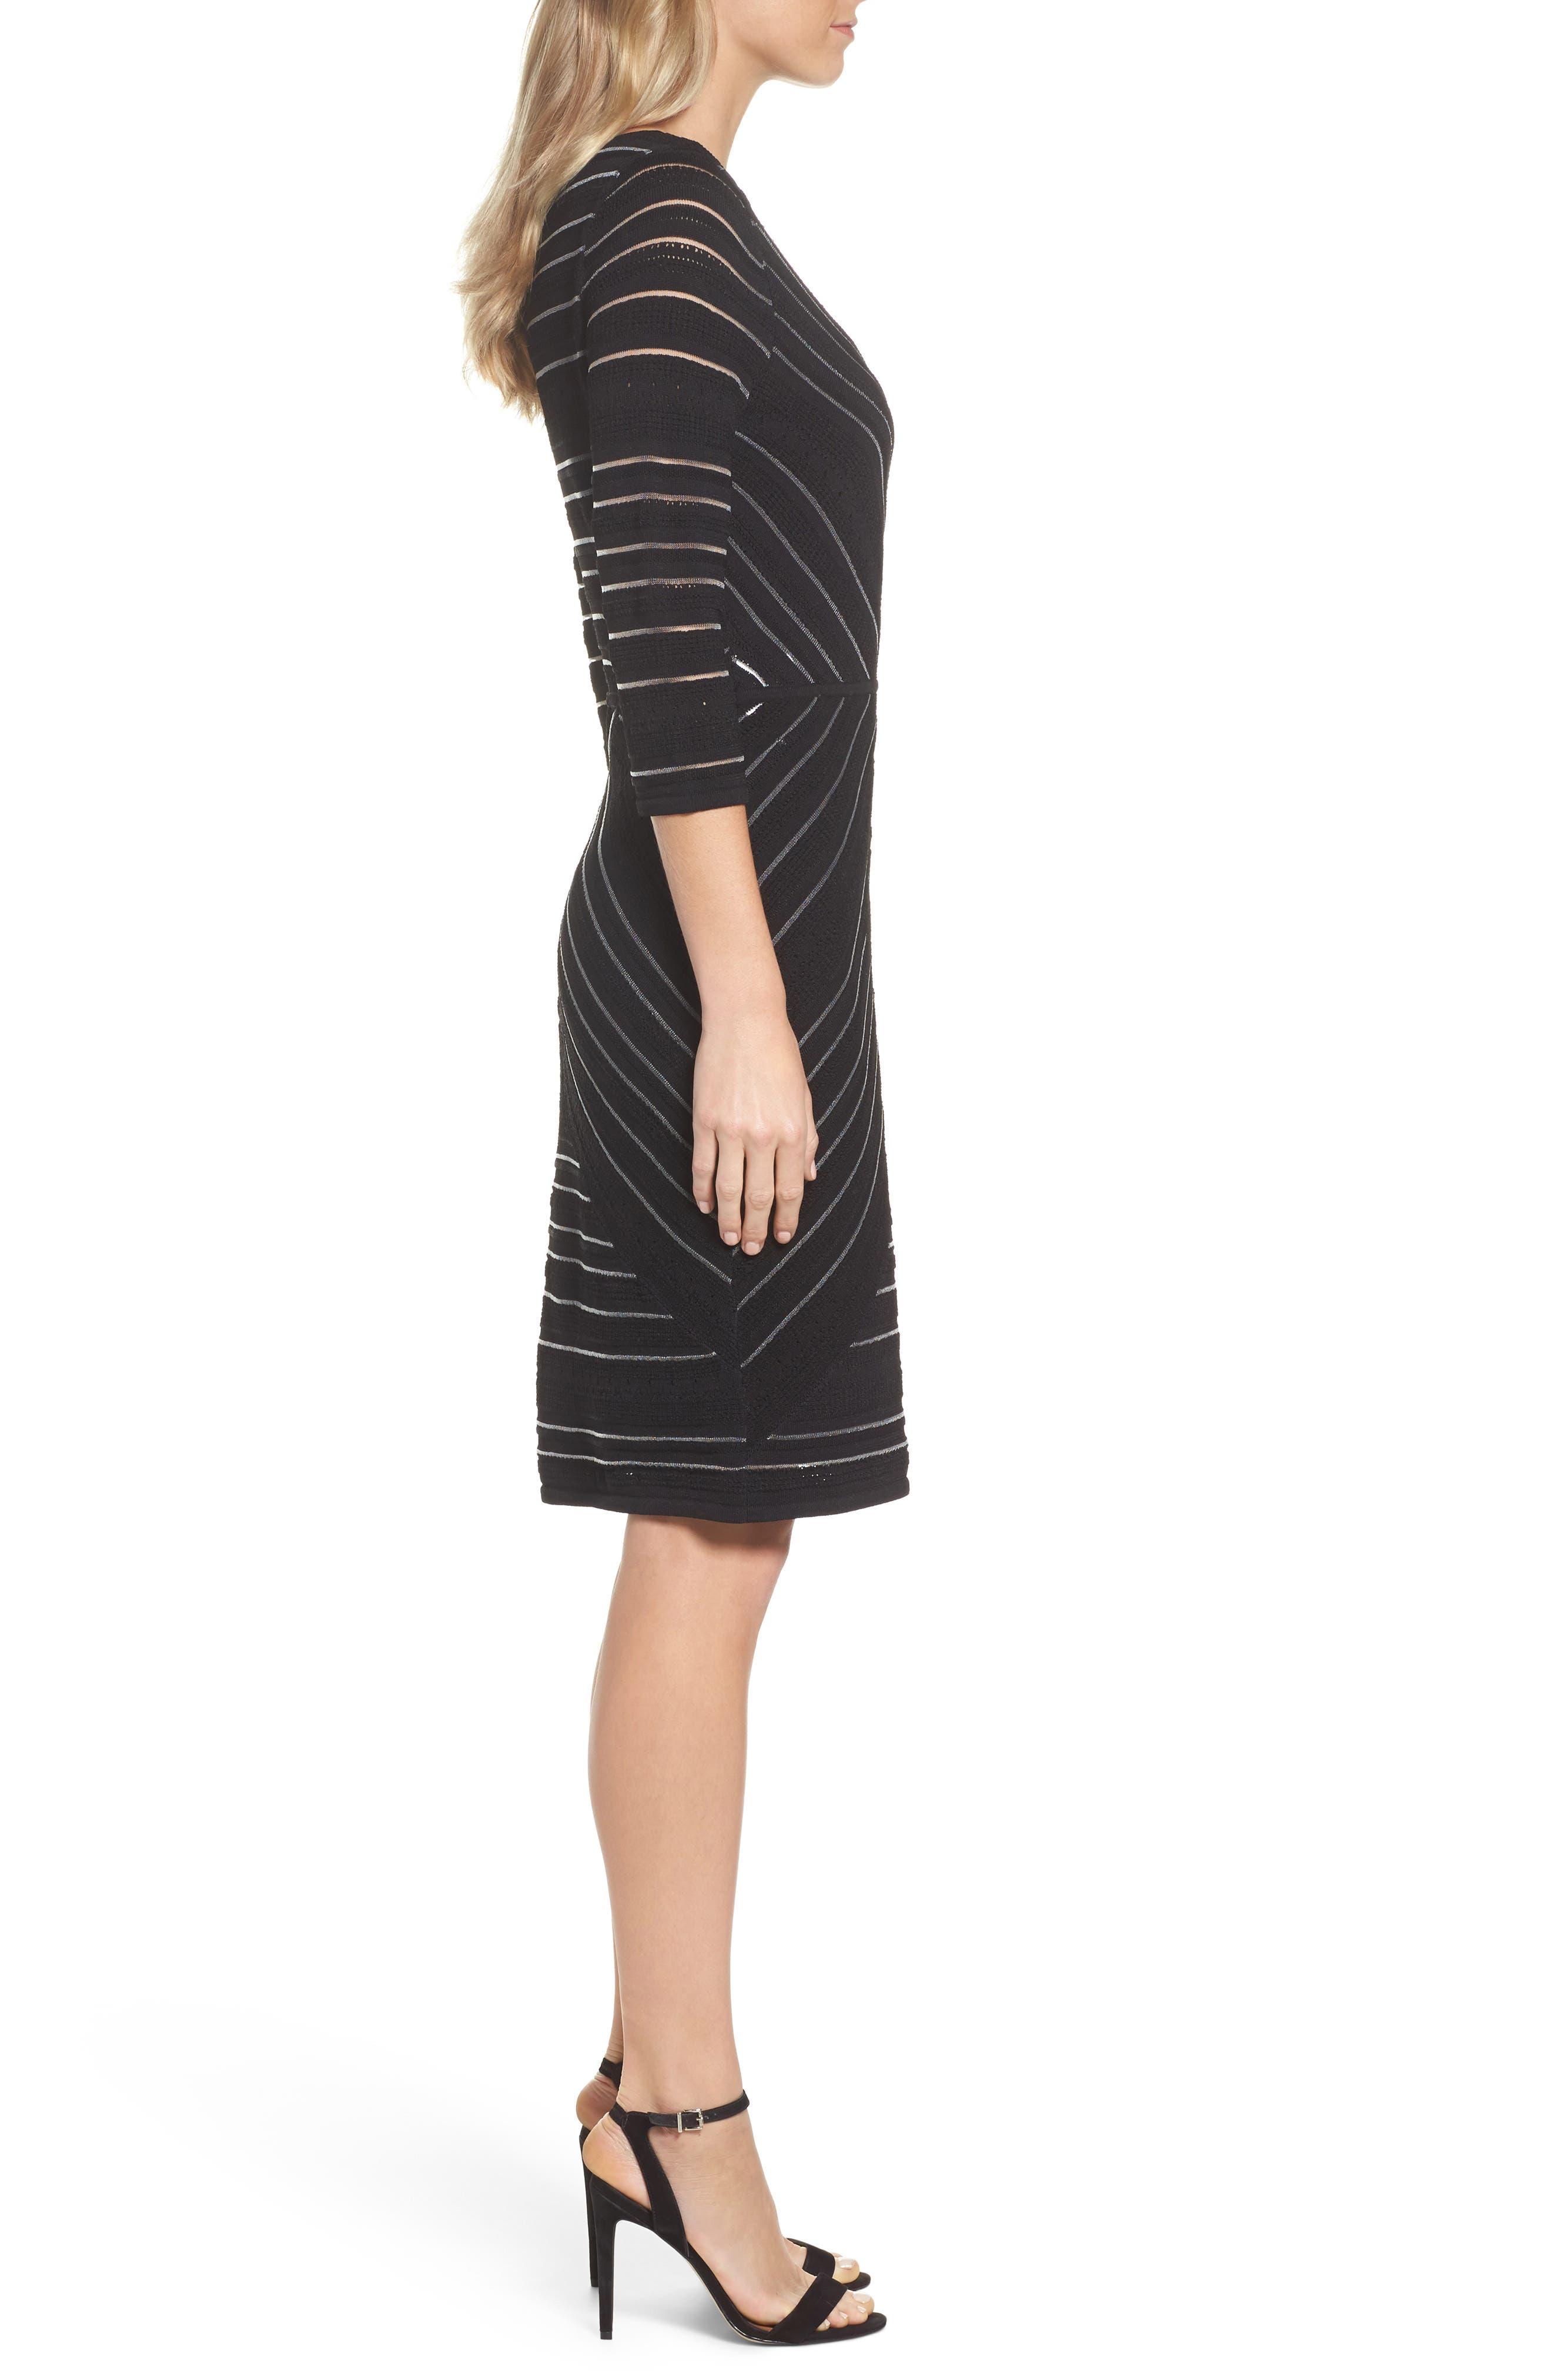 NIC+ ZOE Wrapped Up Sheath Dress,                             Alternate thumbnail 3, color,                             Black Onyx